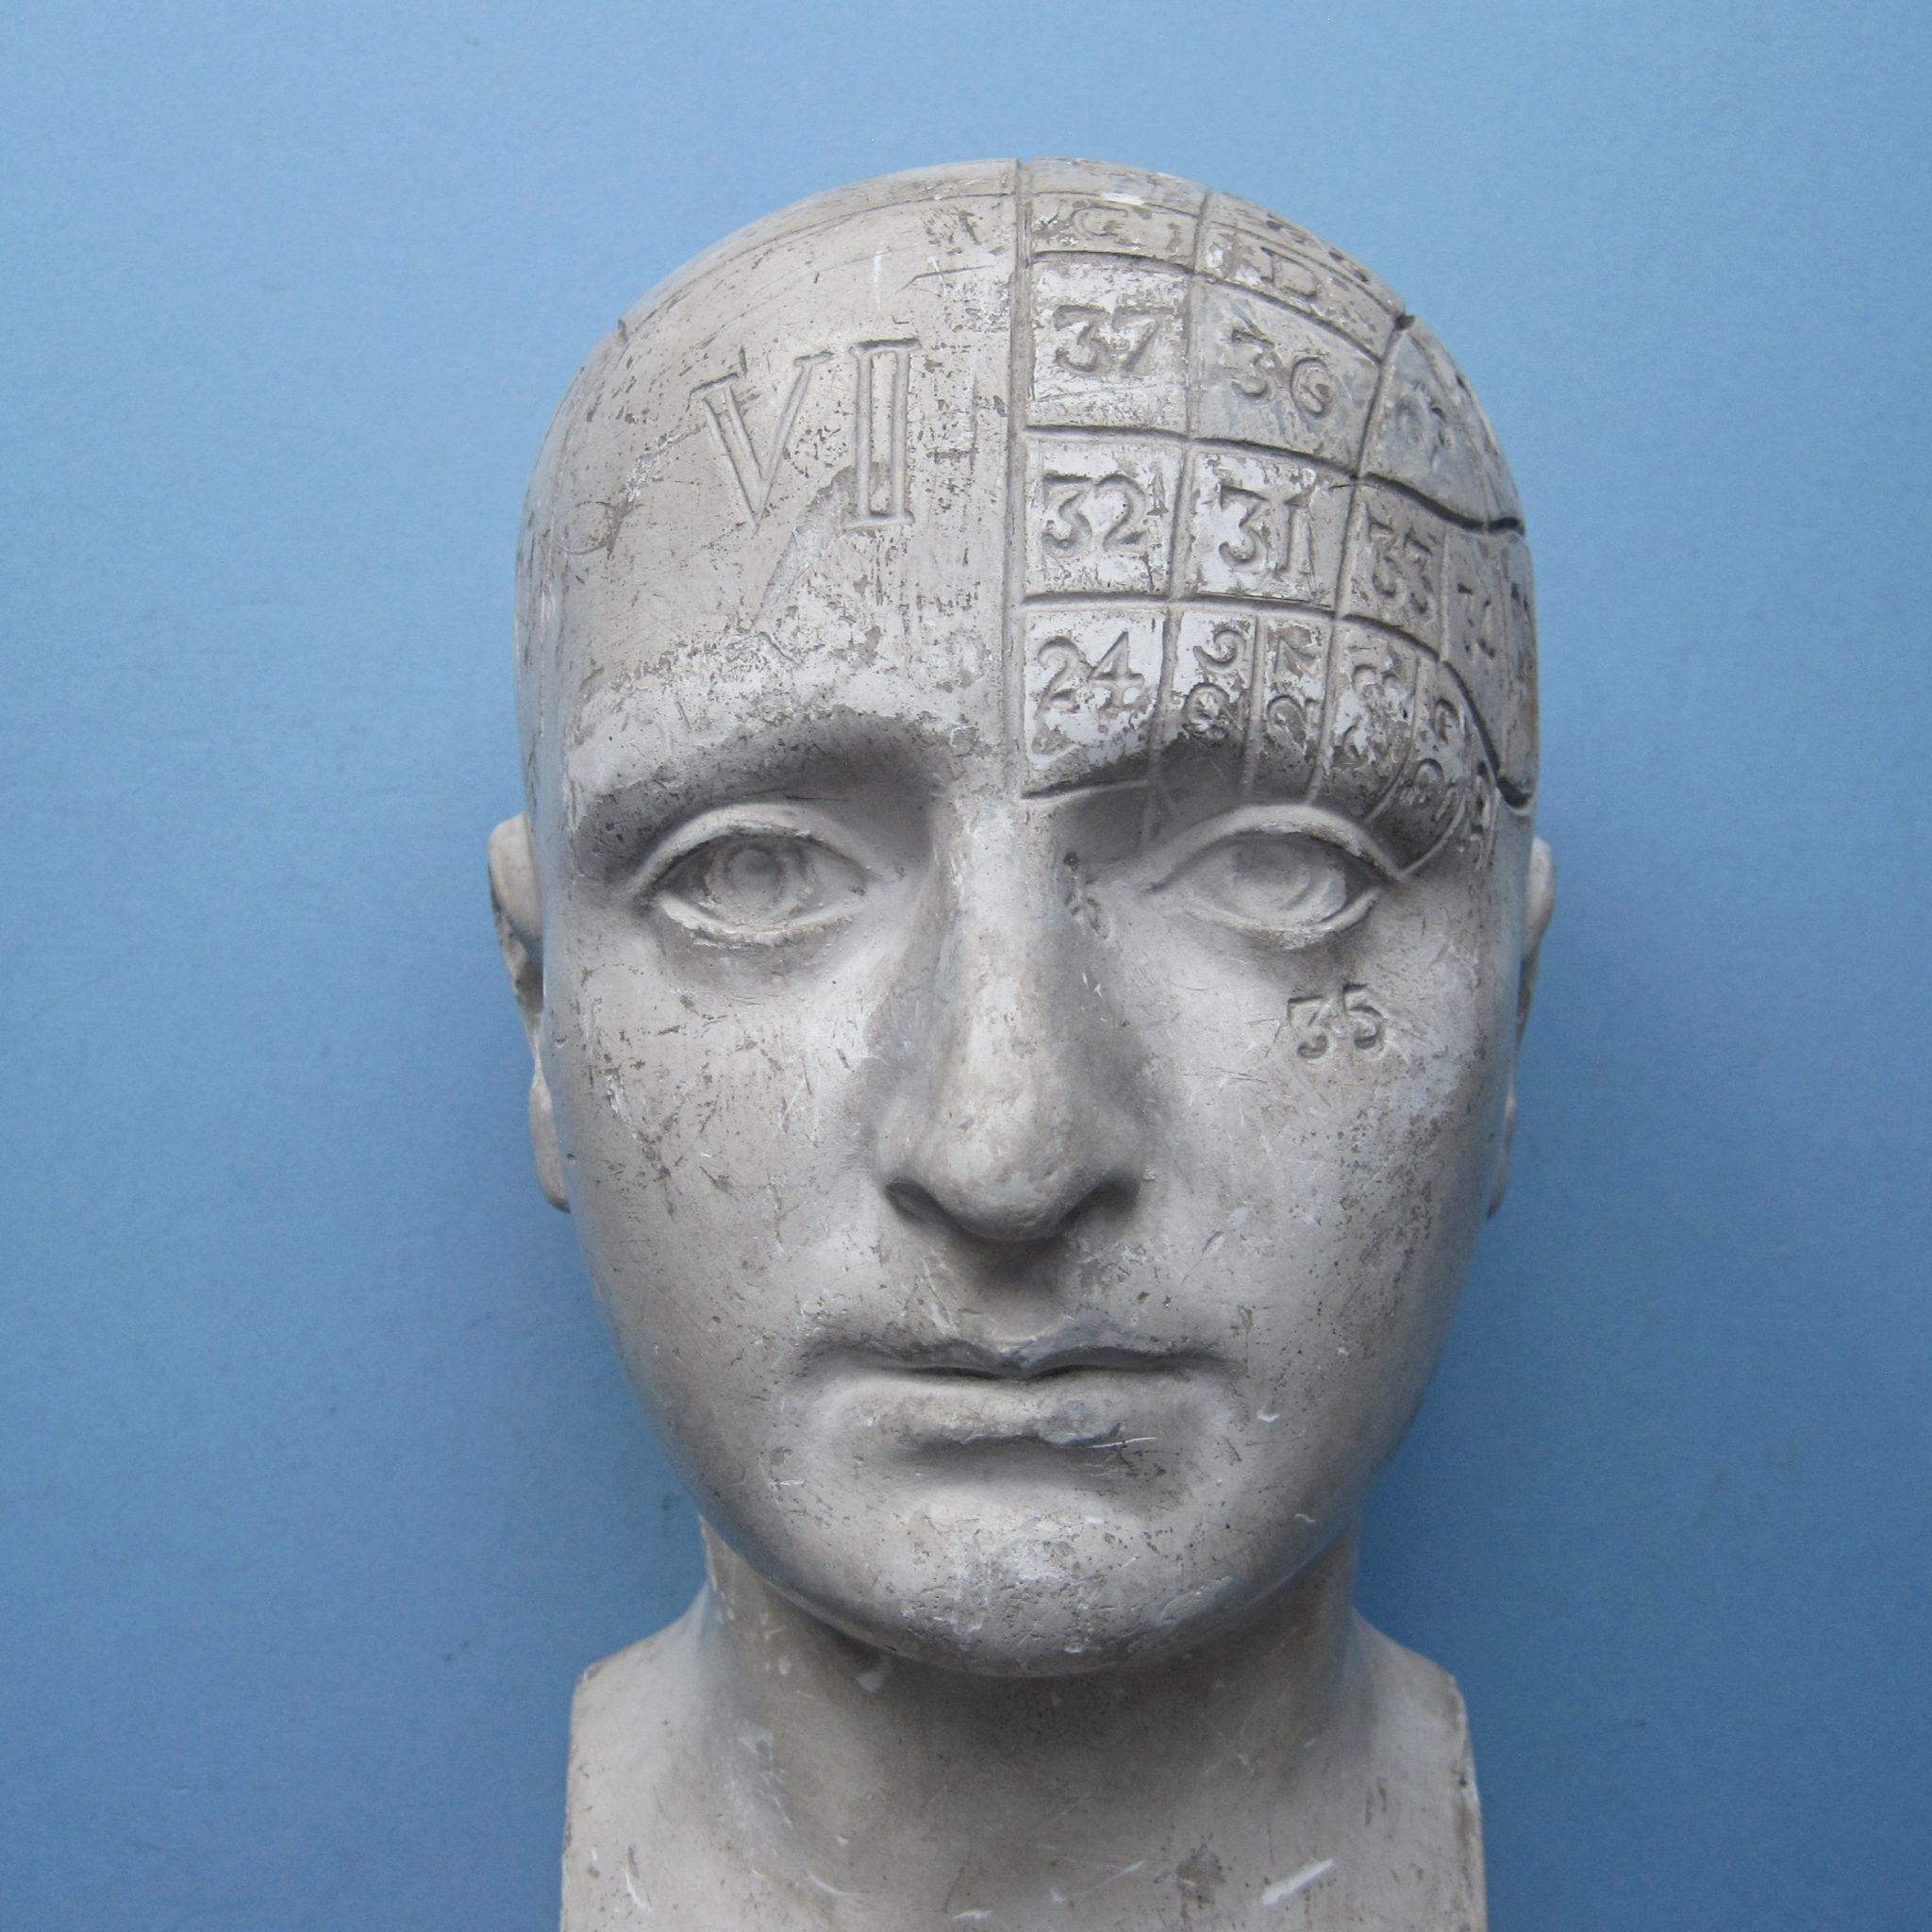 FOWLER & WELLS Variant Phrenological Head